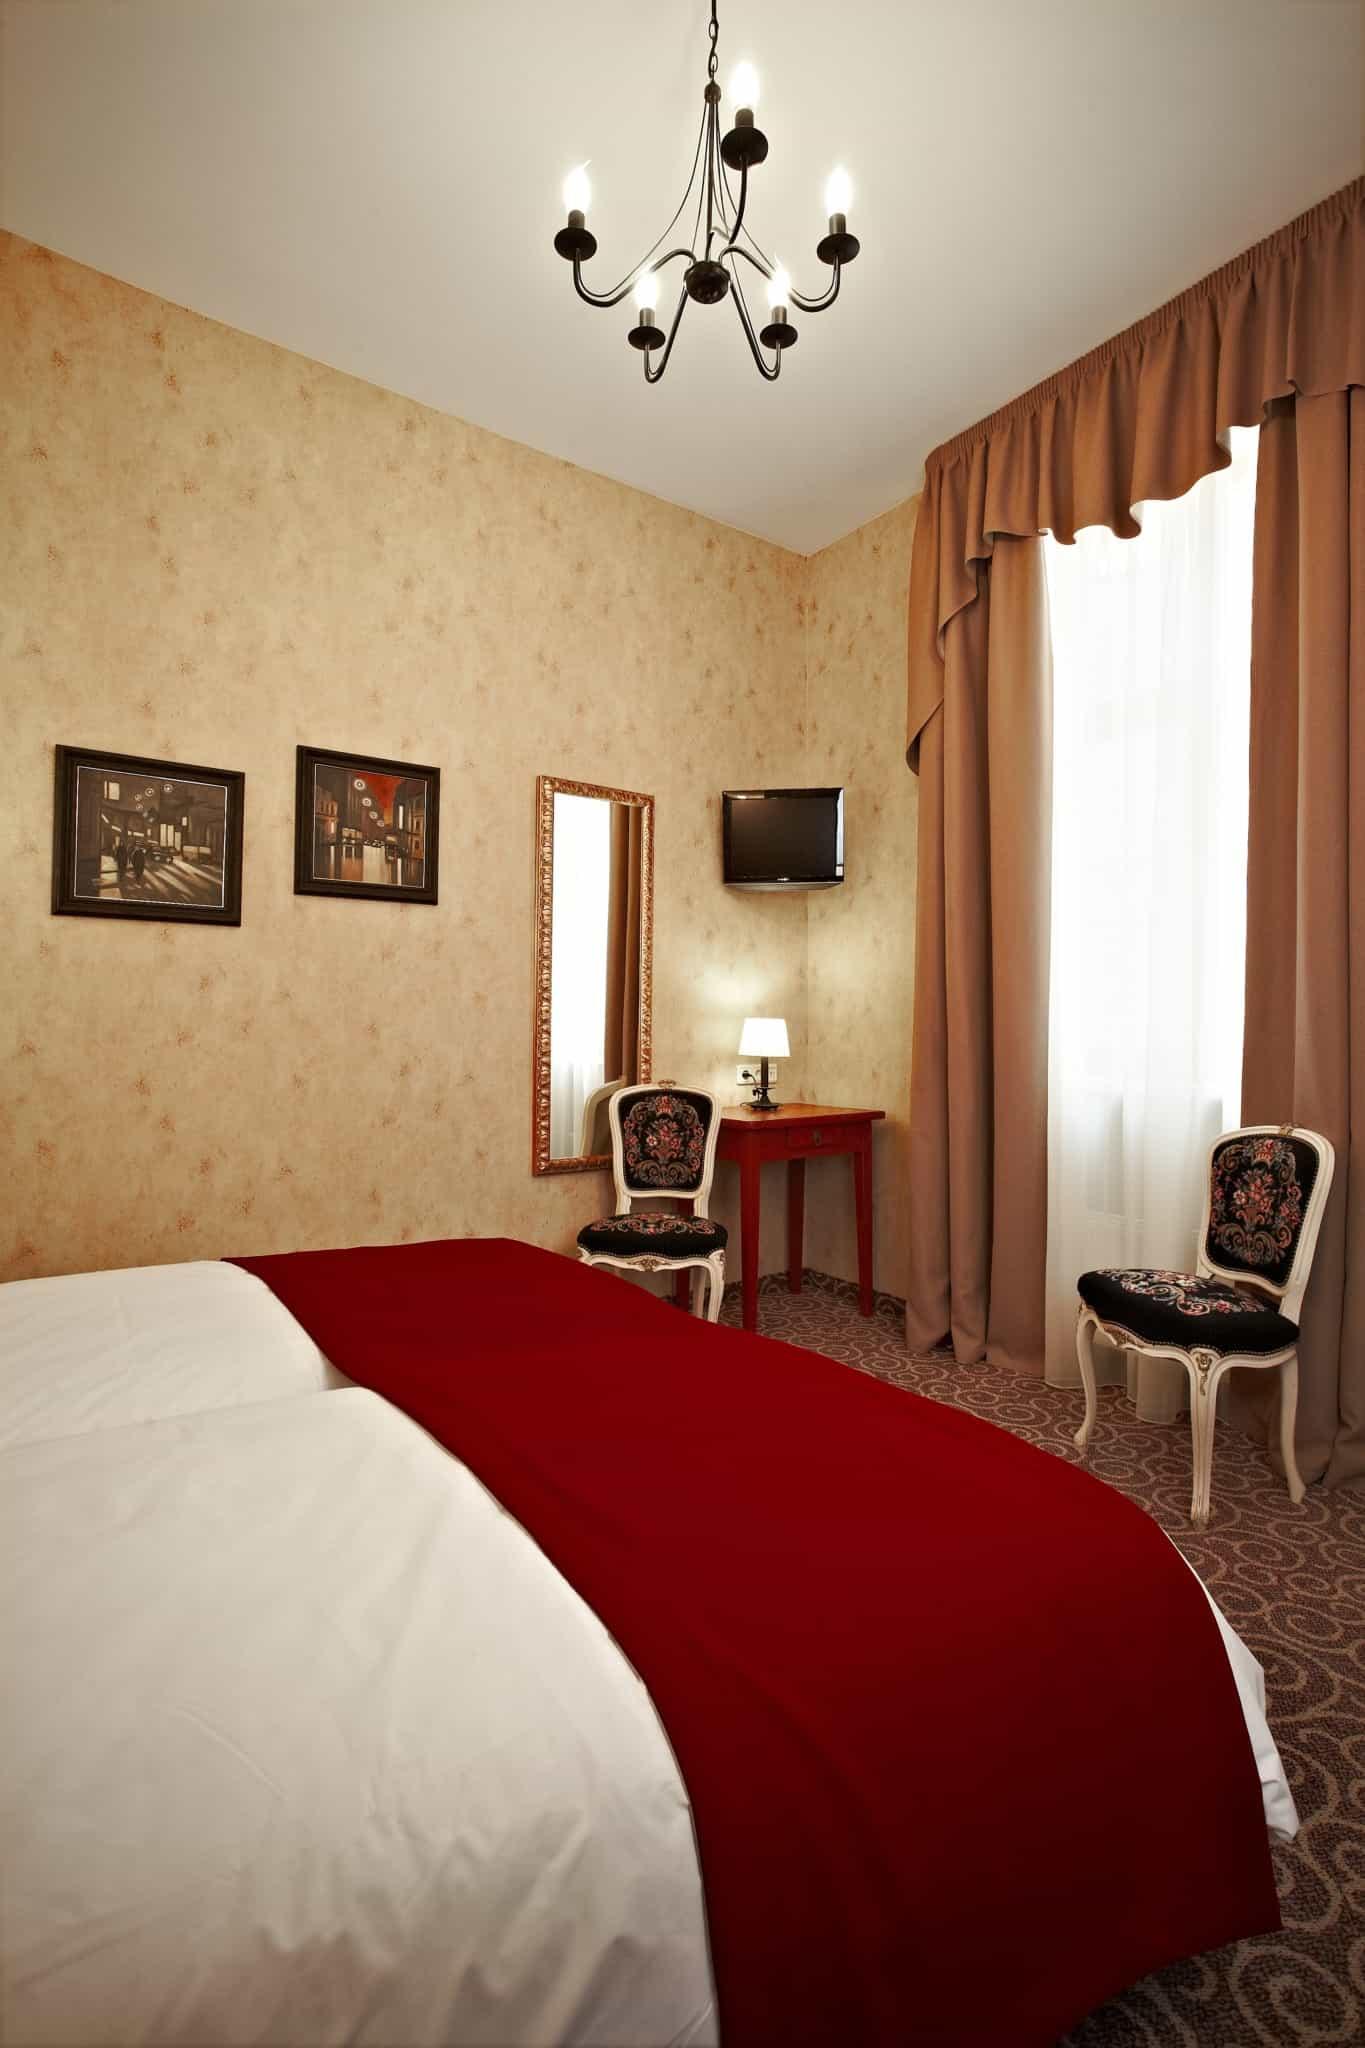 Standard Hotel Room: Standard Double Room At Hotel Justus